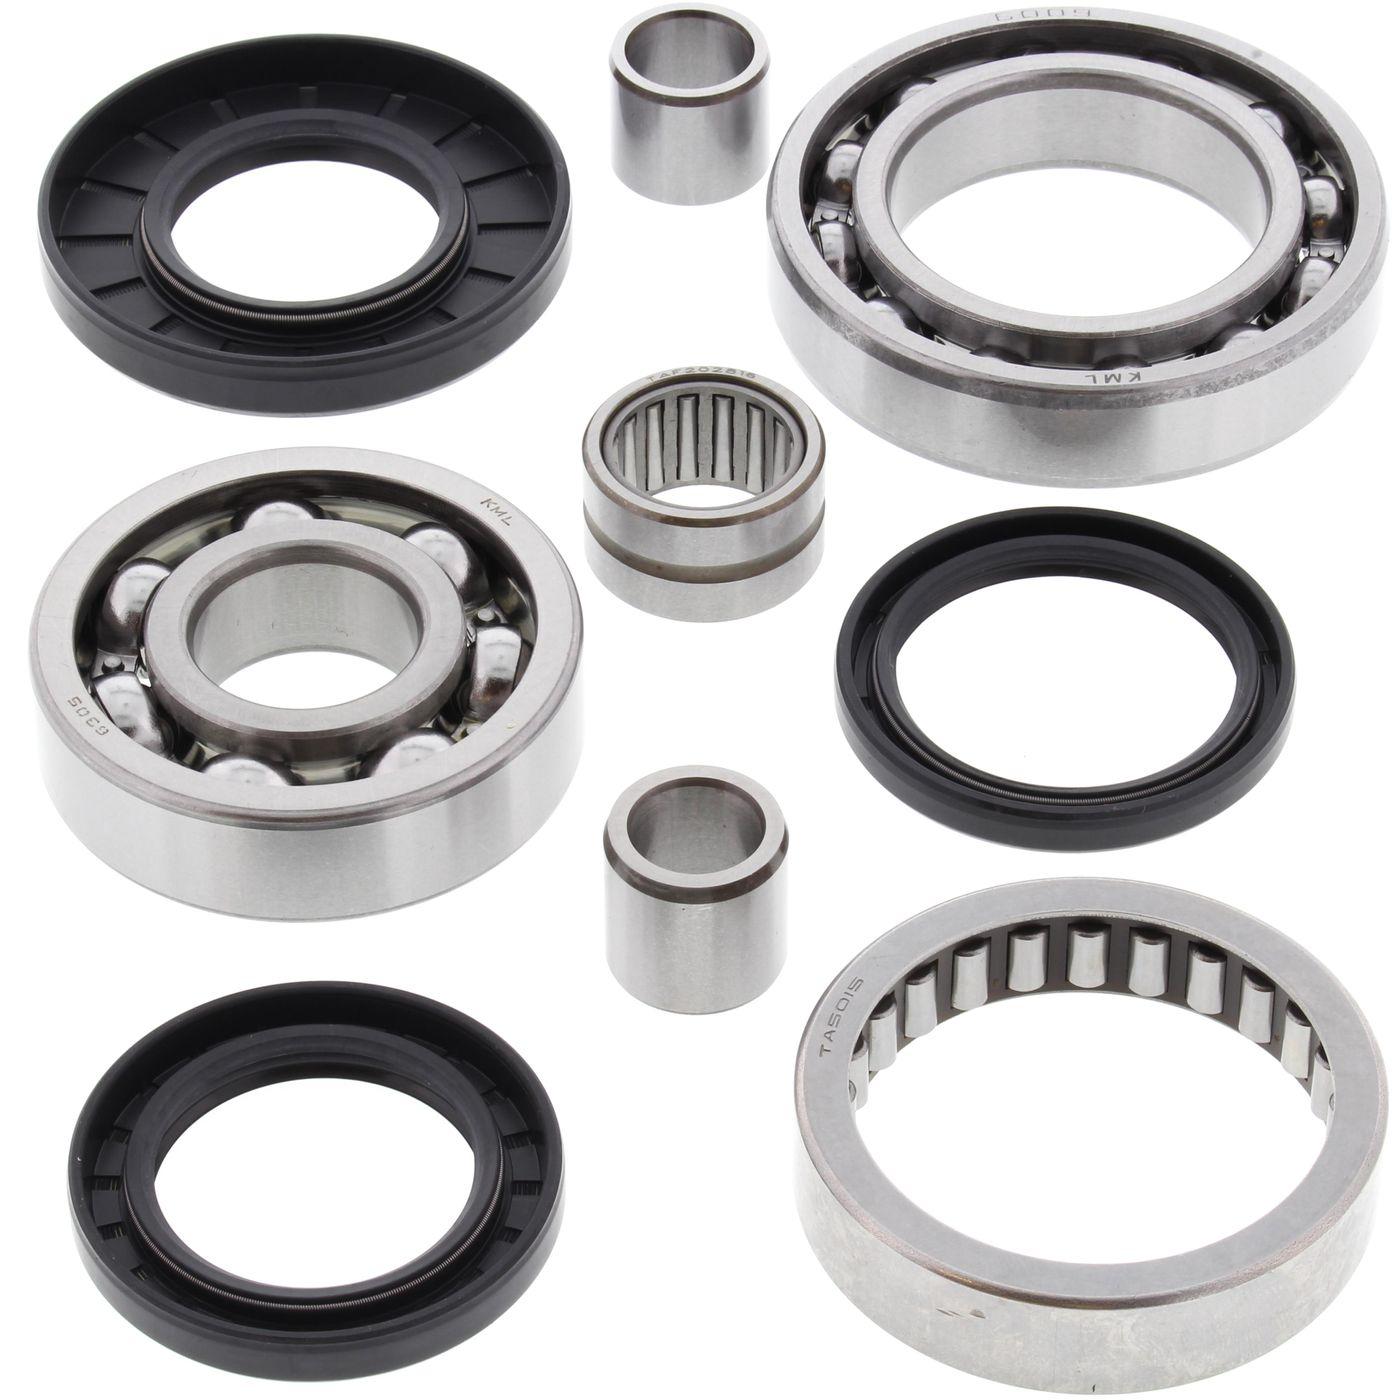 Wrp Diff Bearing & Seal Kits - WRP252021 image